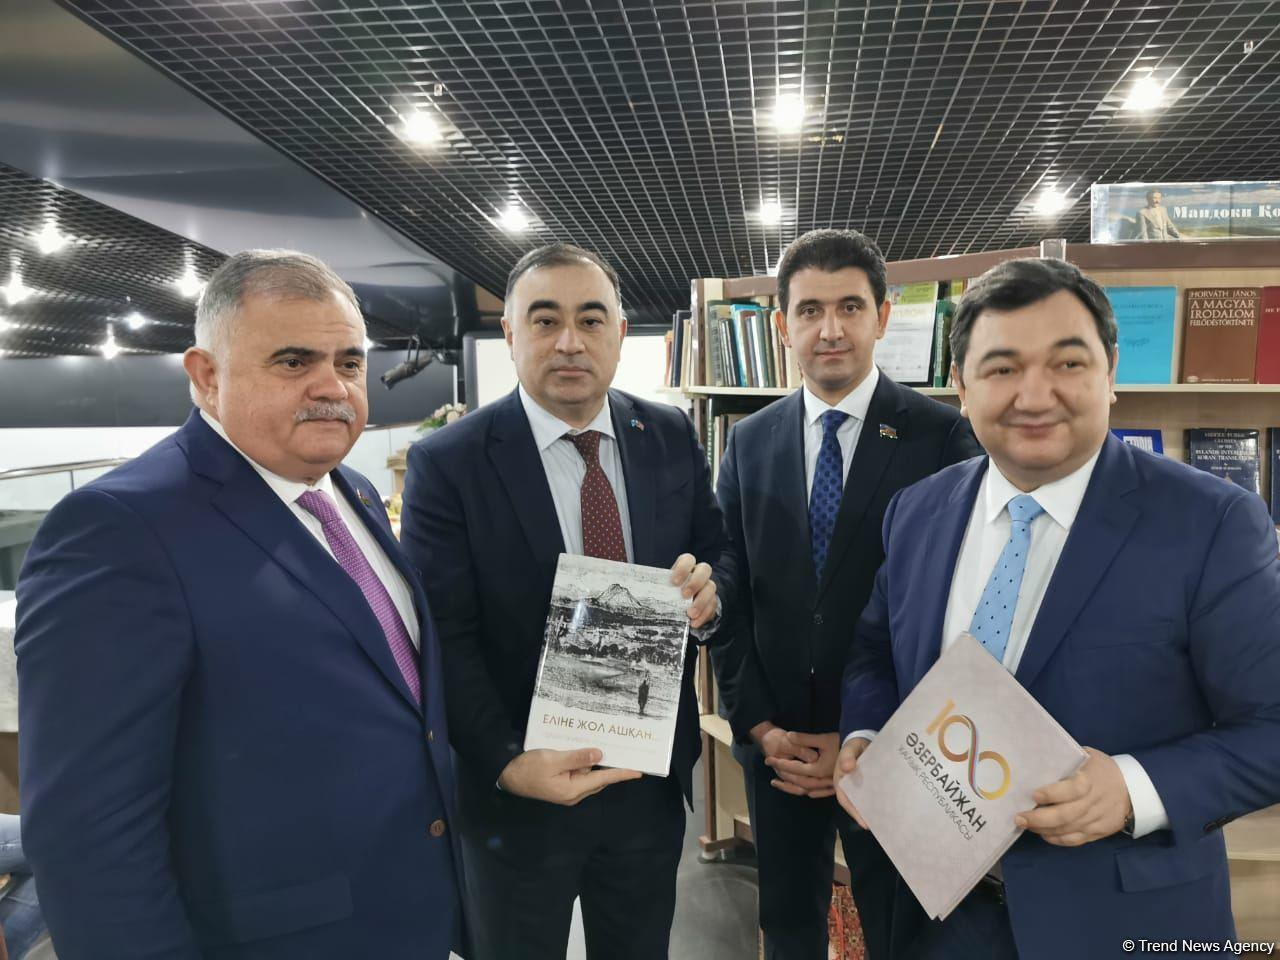 В Казахстане прошла презентация книг о Карабахе